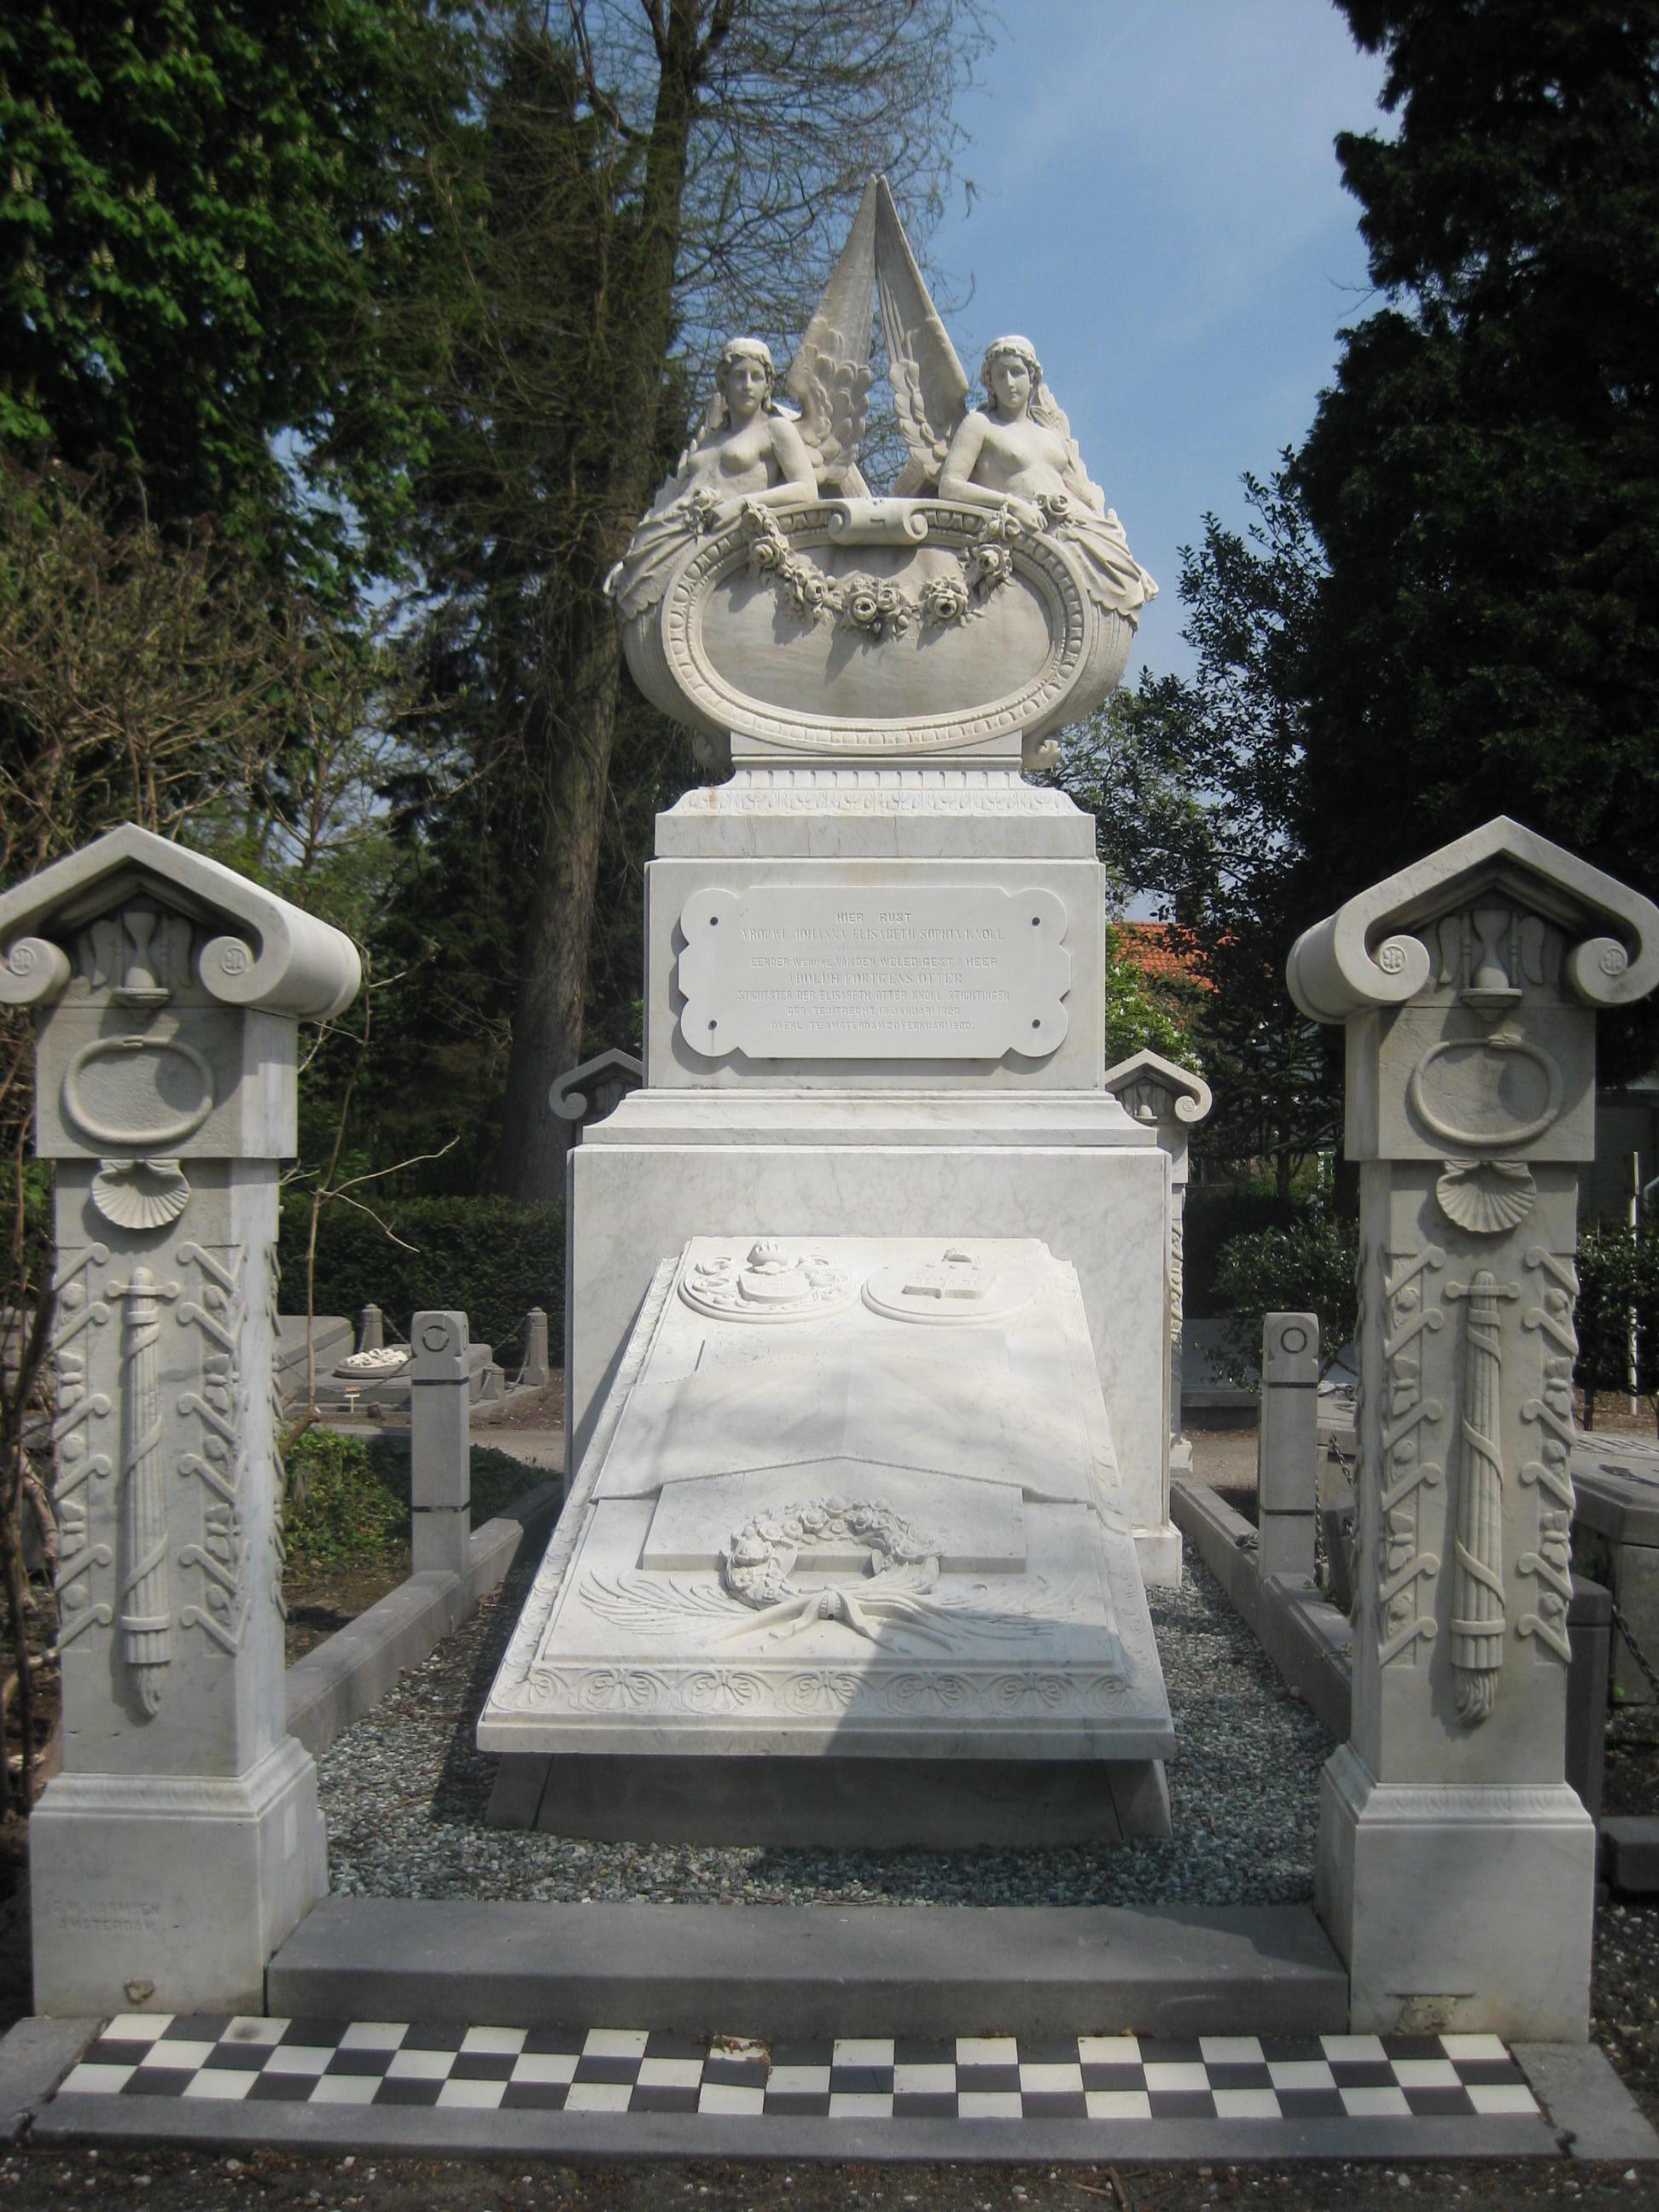 arthur kleijwegt overleden